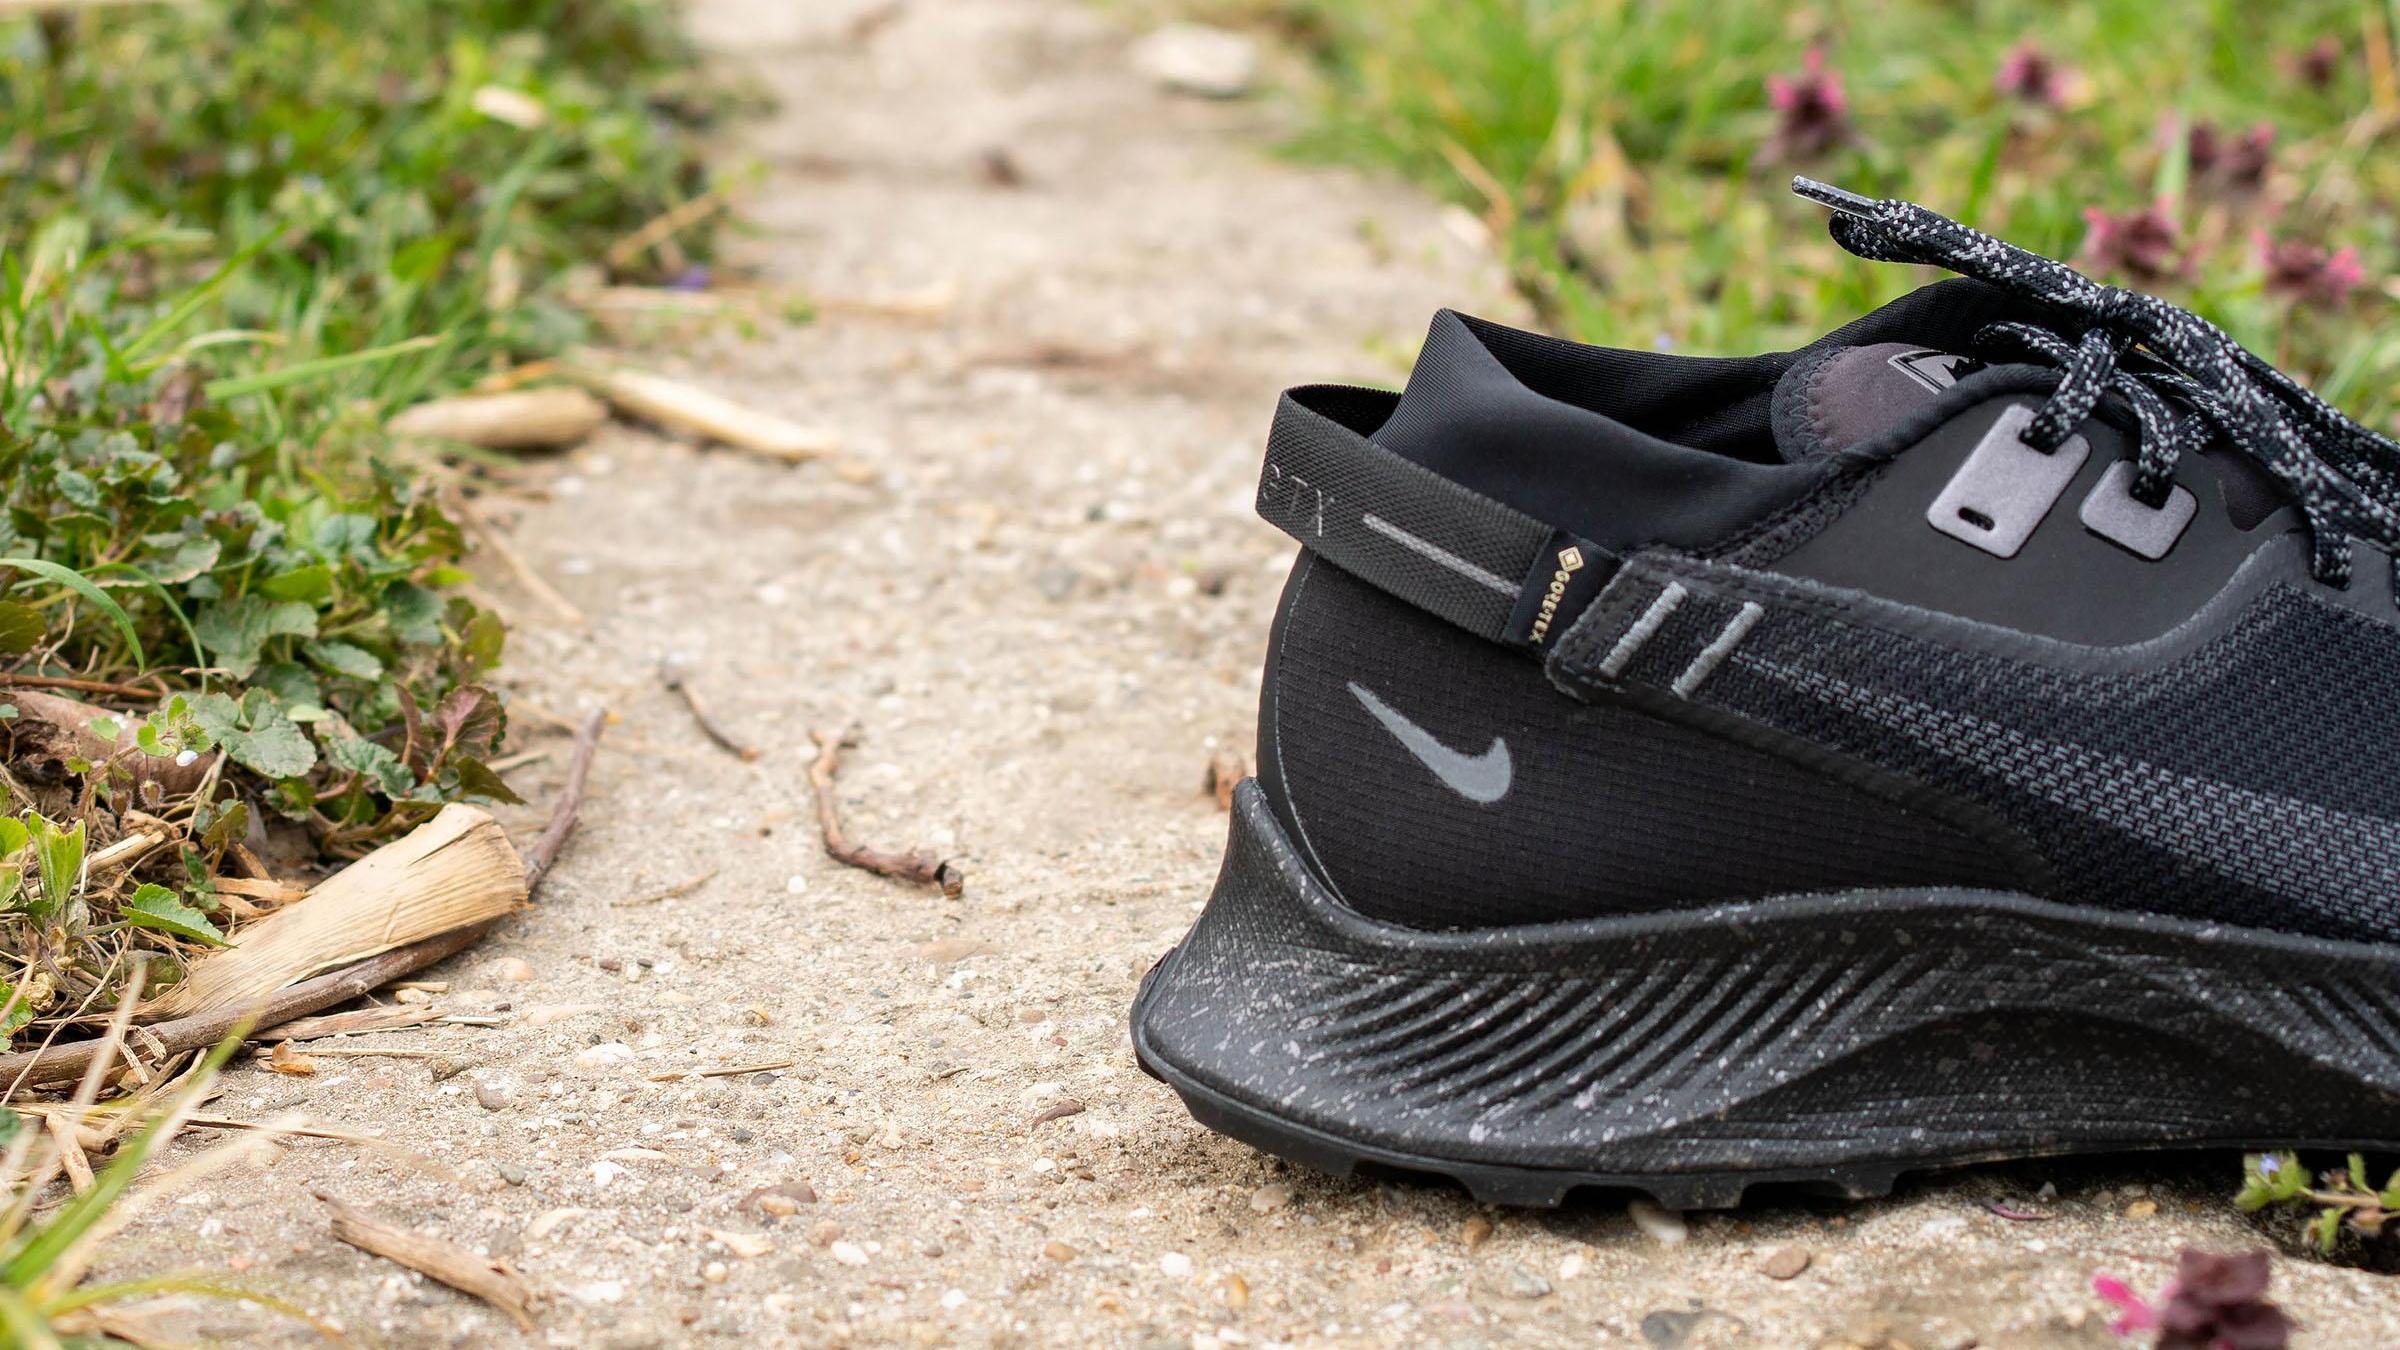 10 Best Black Nike Running Shoes in 2021